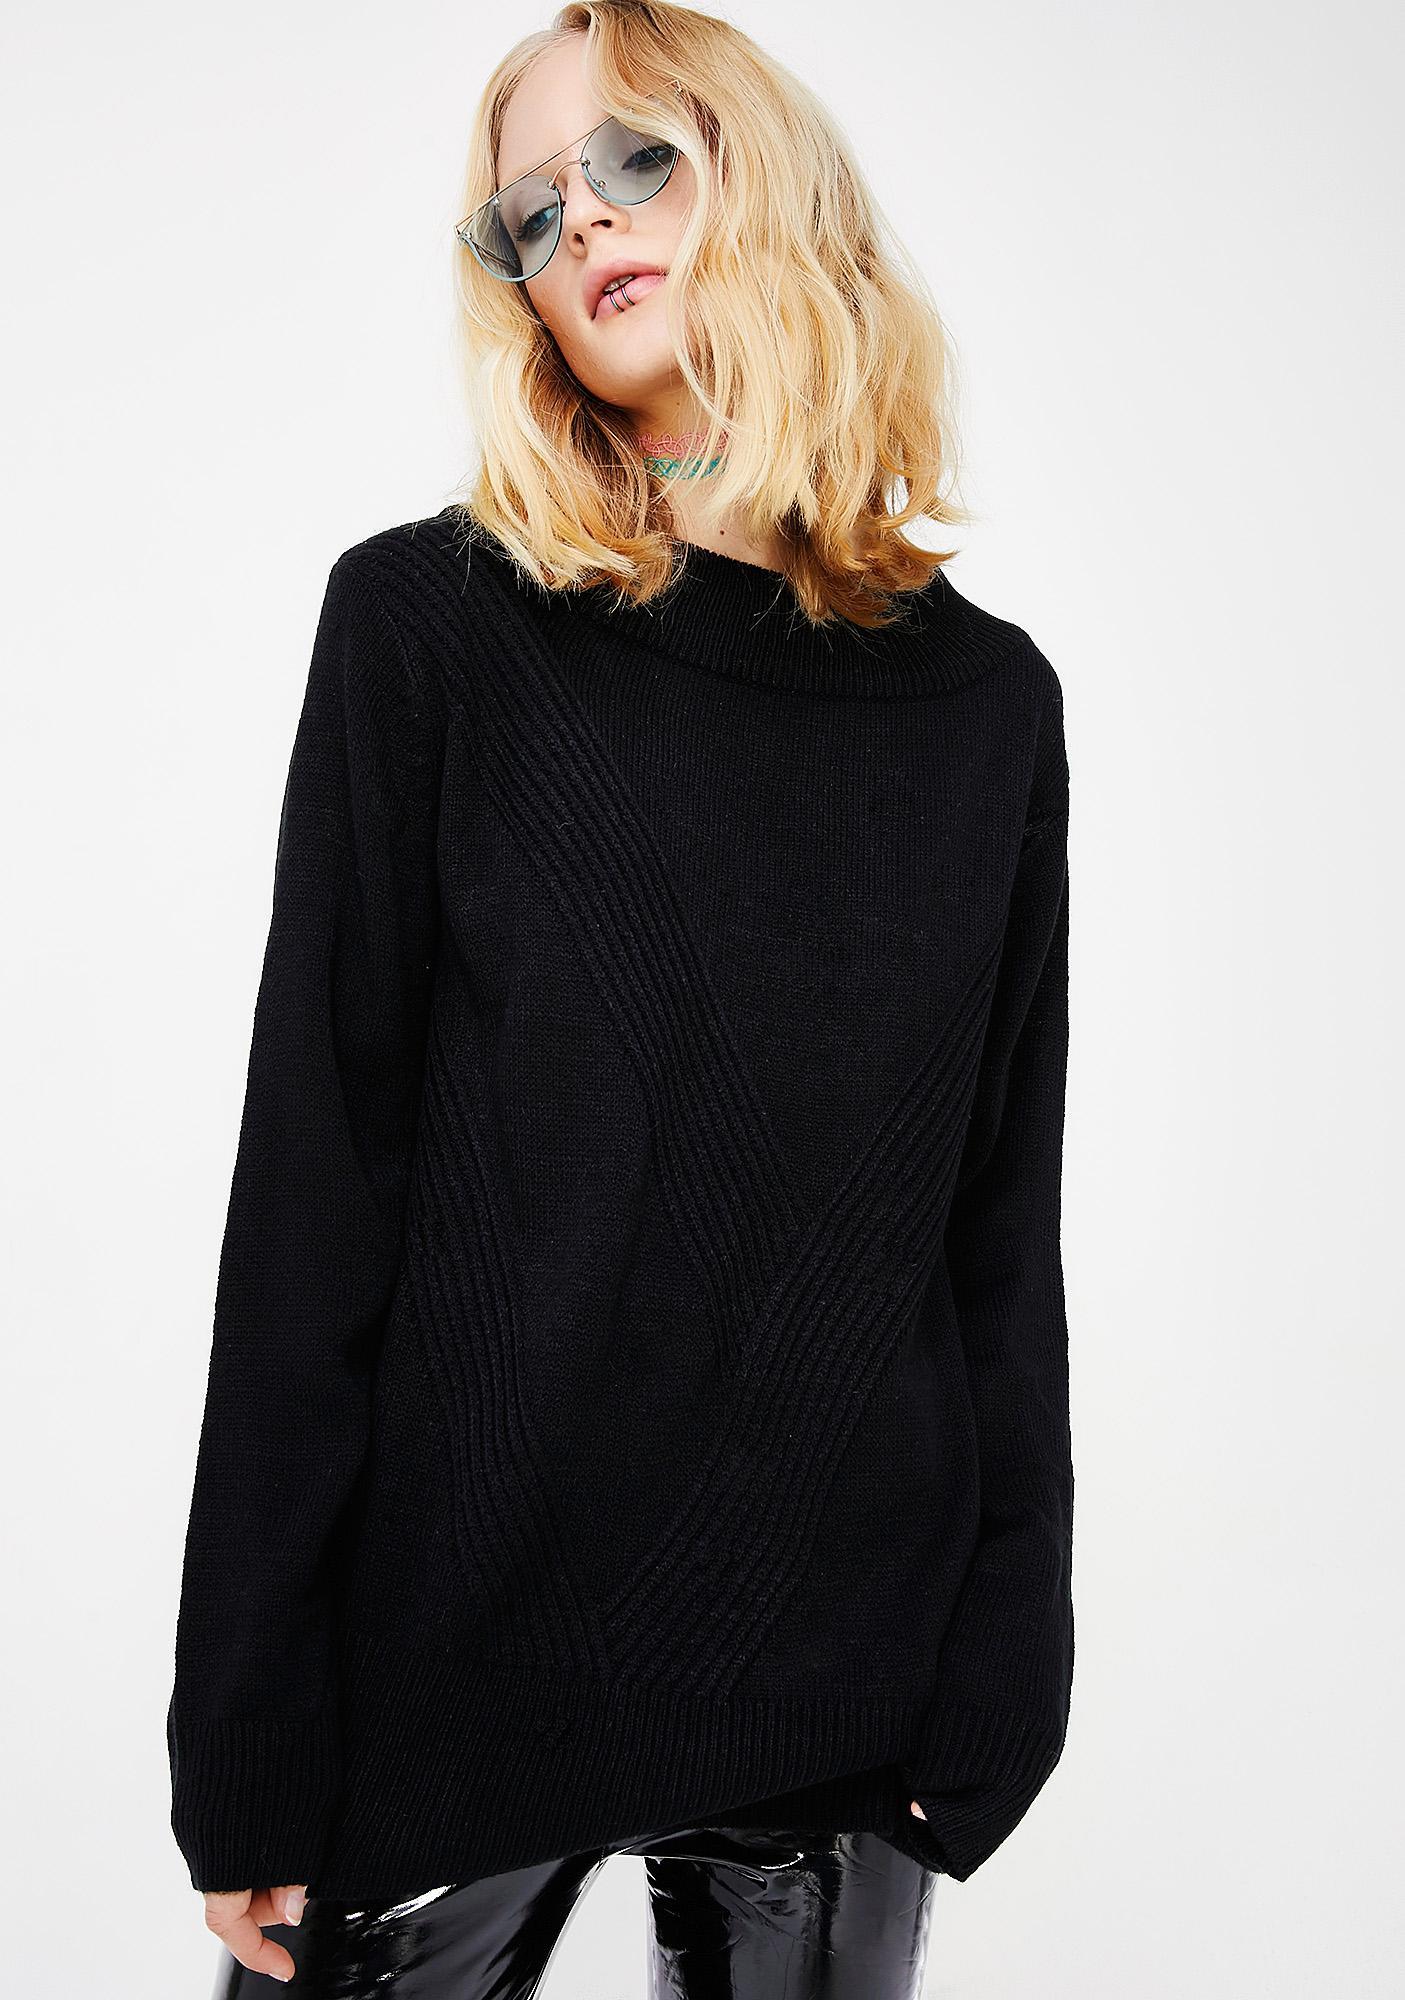 Midnight Undercover Freak Strap Sweater